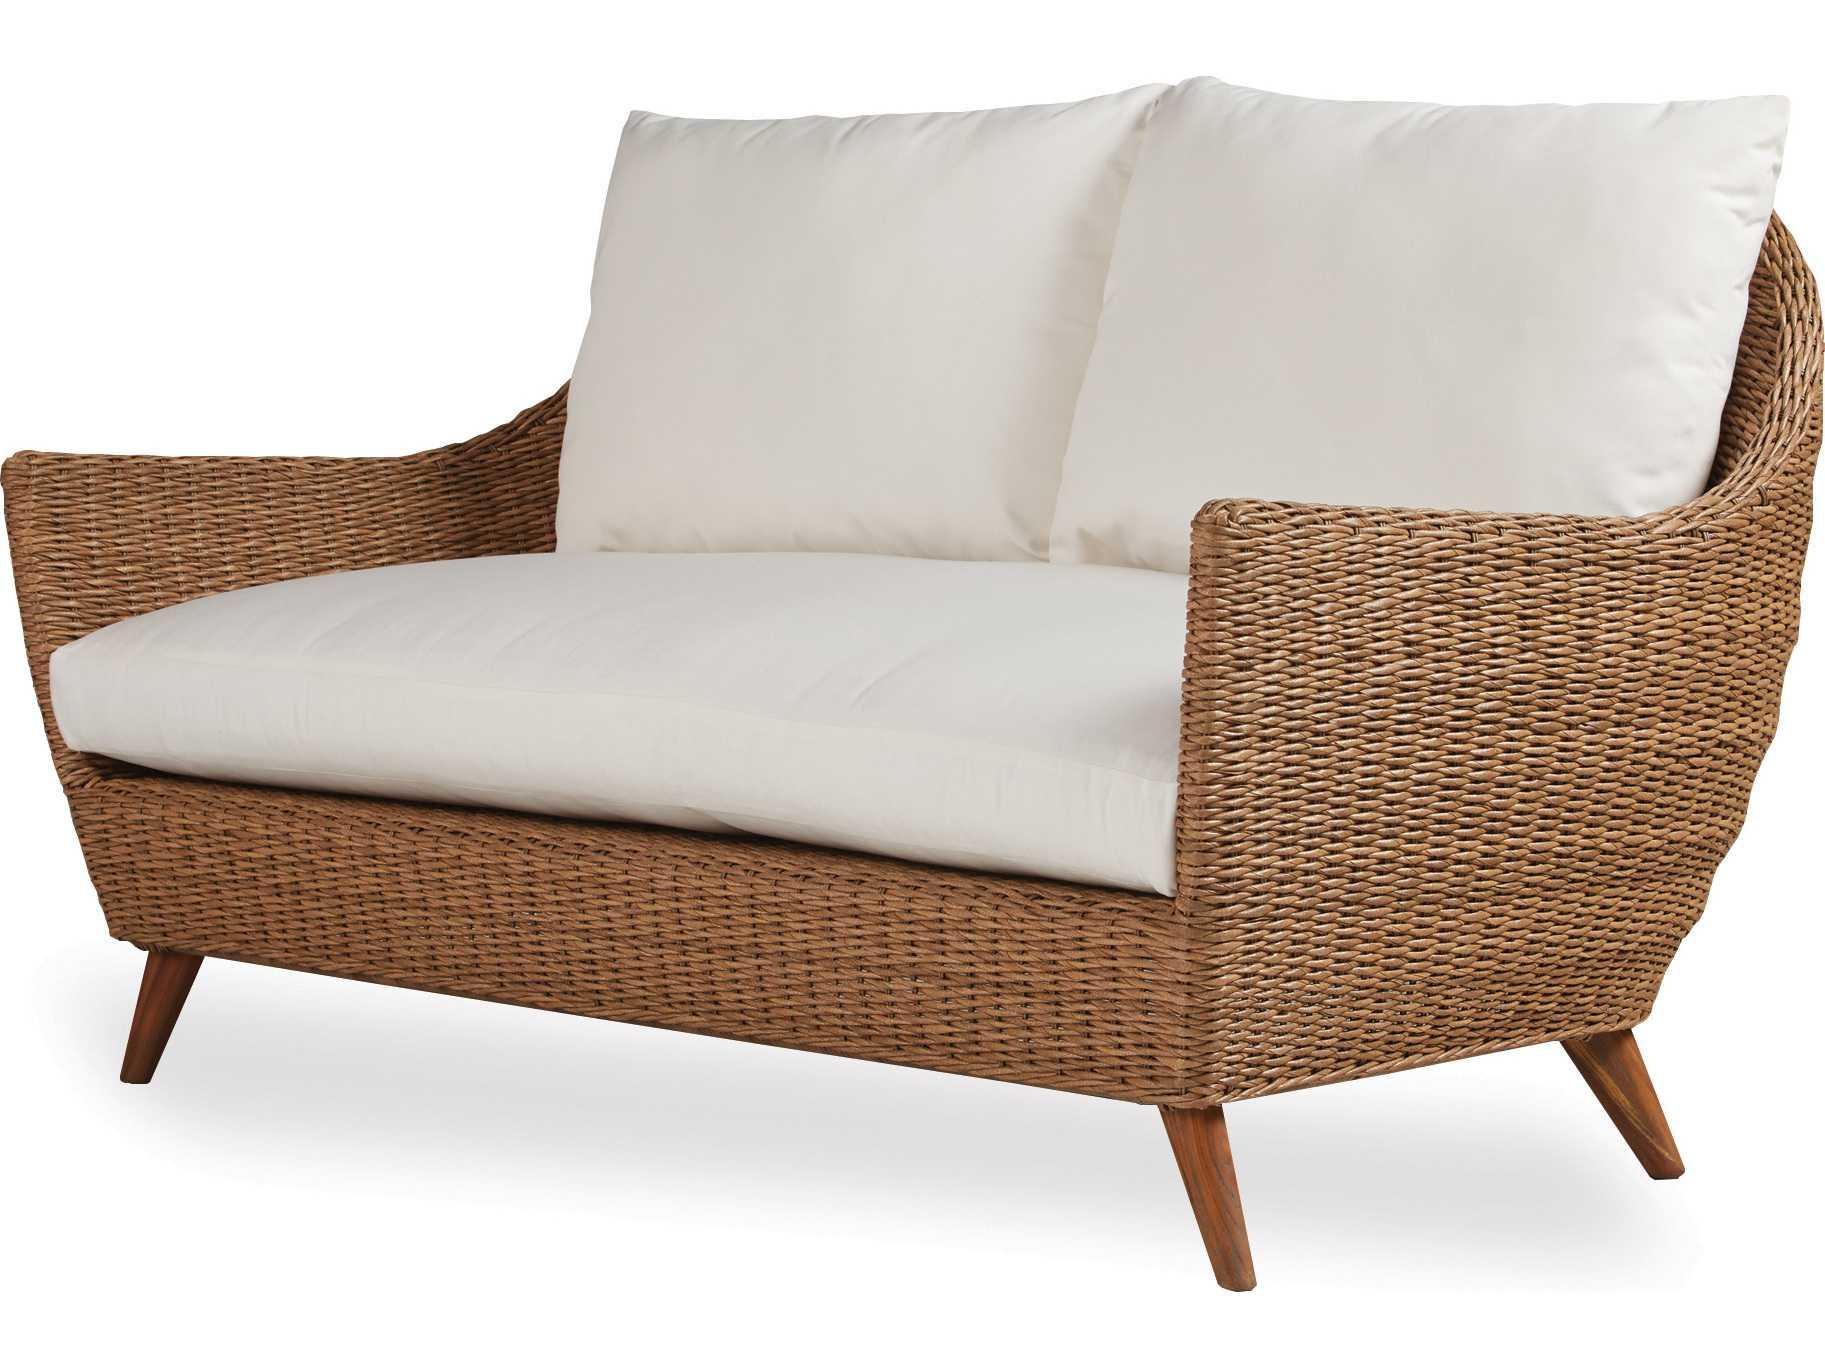 lloyd flanders tobago wicker love seat 426050. Black Bedroom Furniture Sets. Home Design Ideas